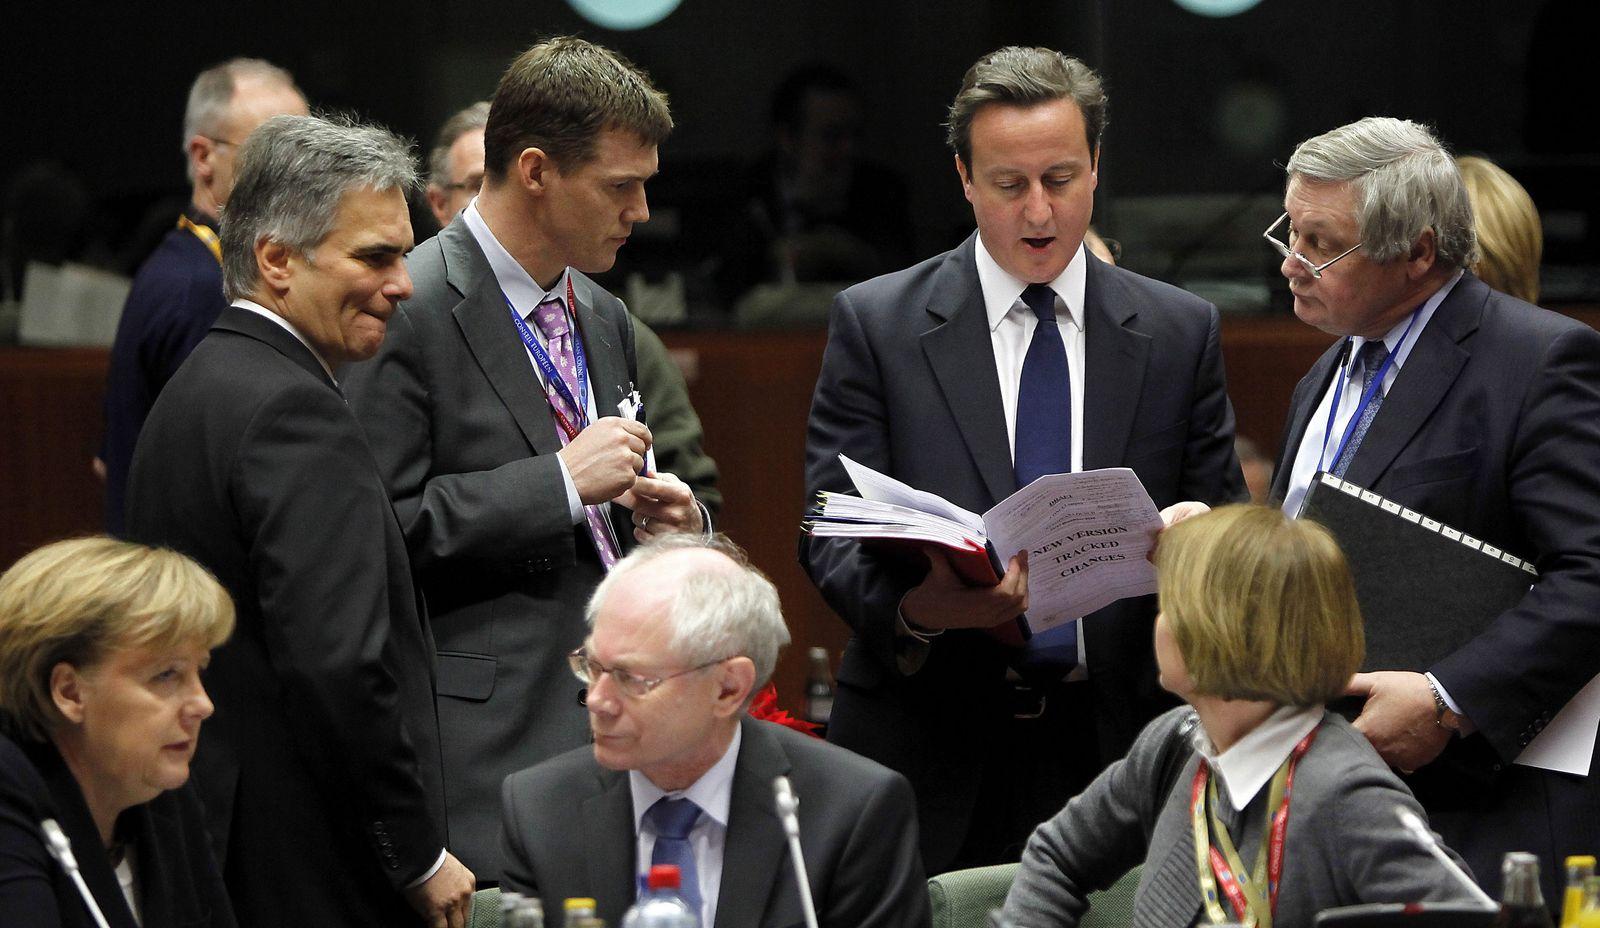 European head of states summit